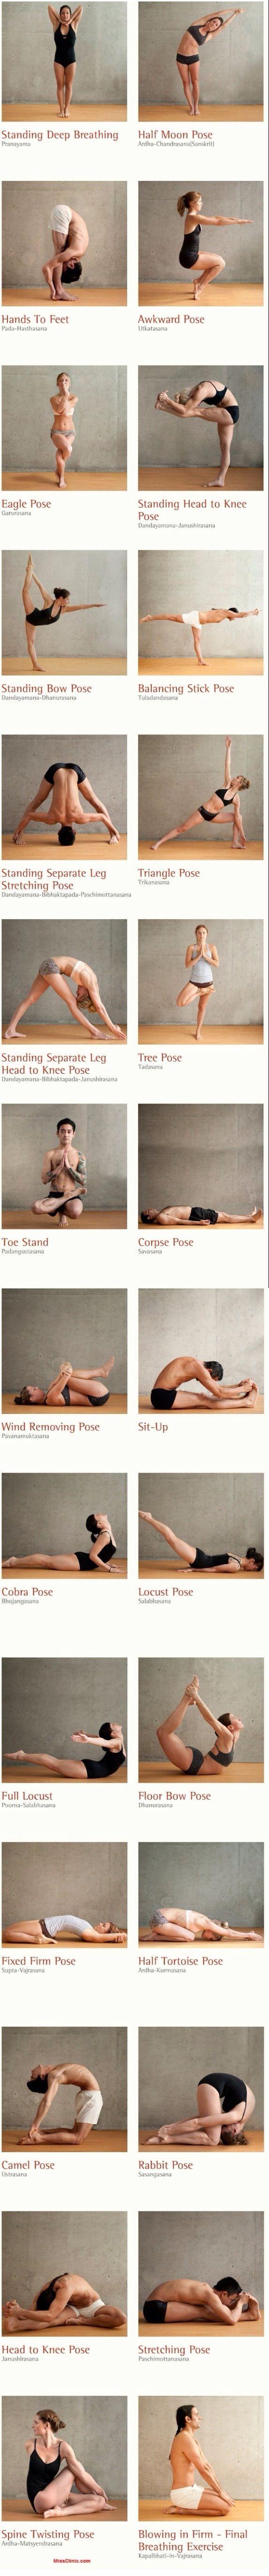 best yoga yogi images on pinterest physical activities yoga